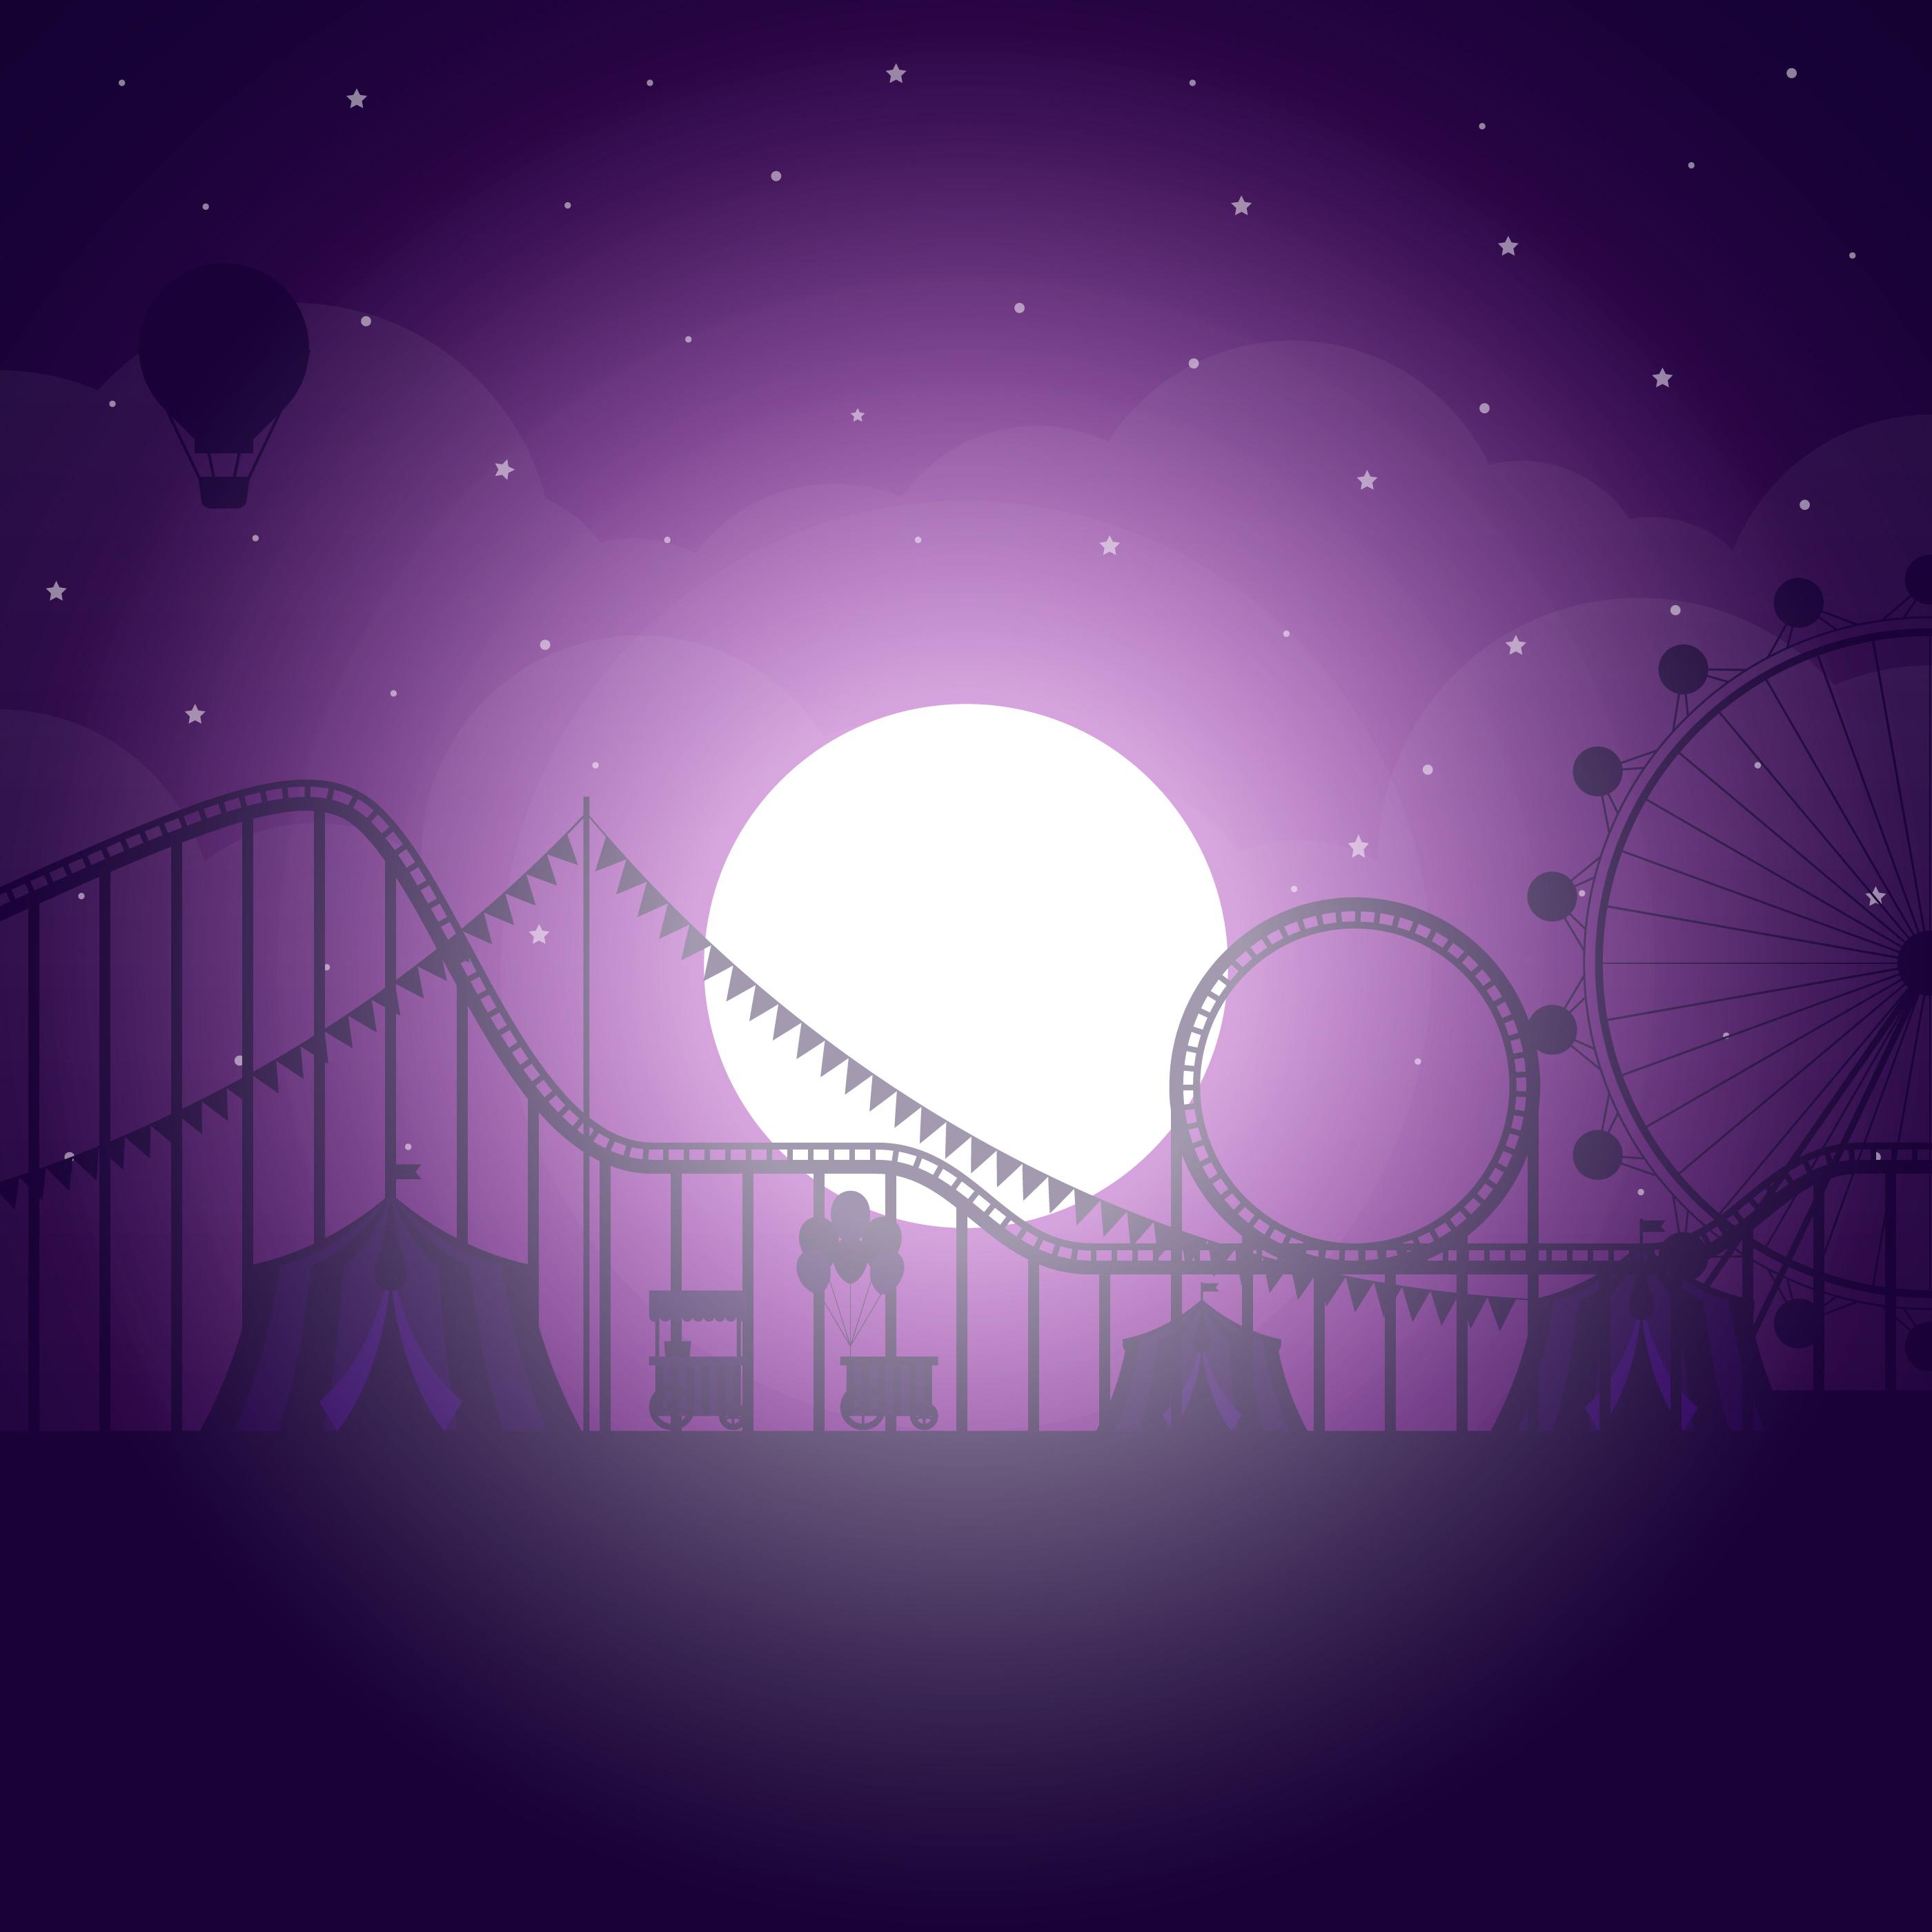 Vector Illustration Web Designs: Amusement Park Scenery Under The Moonlight Illustration